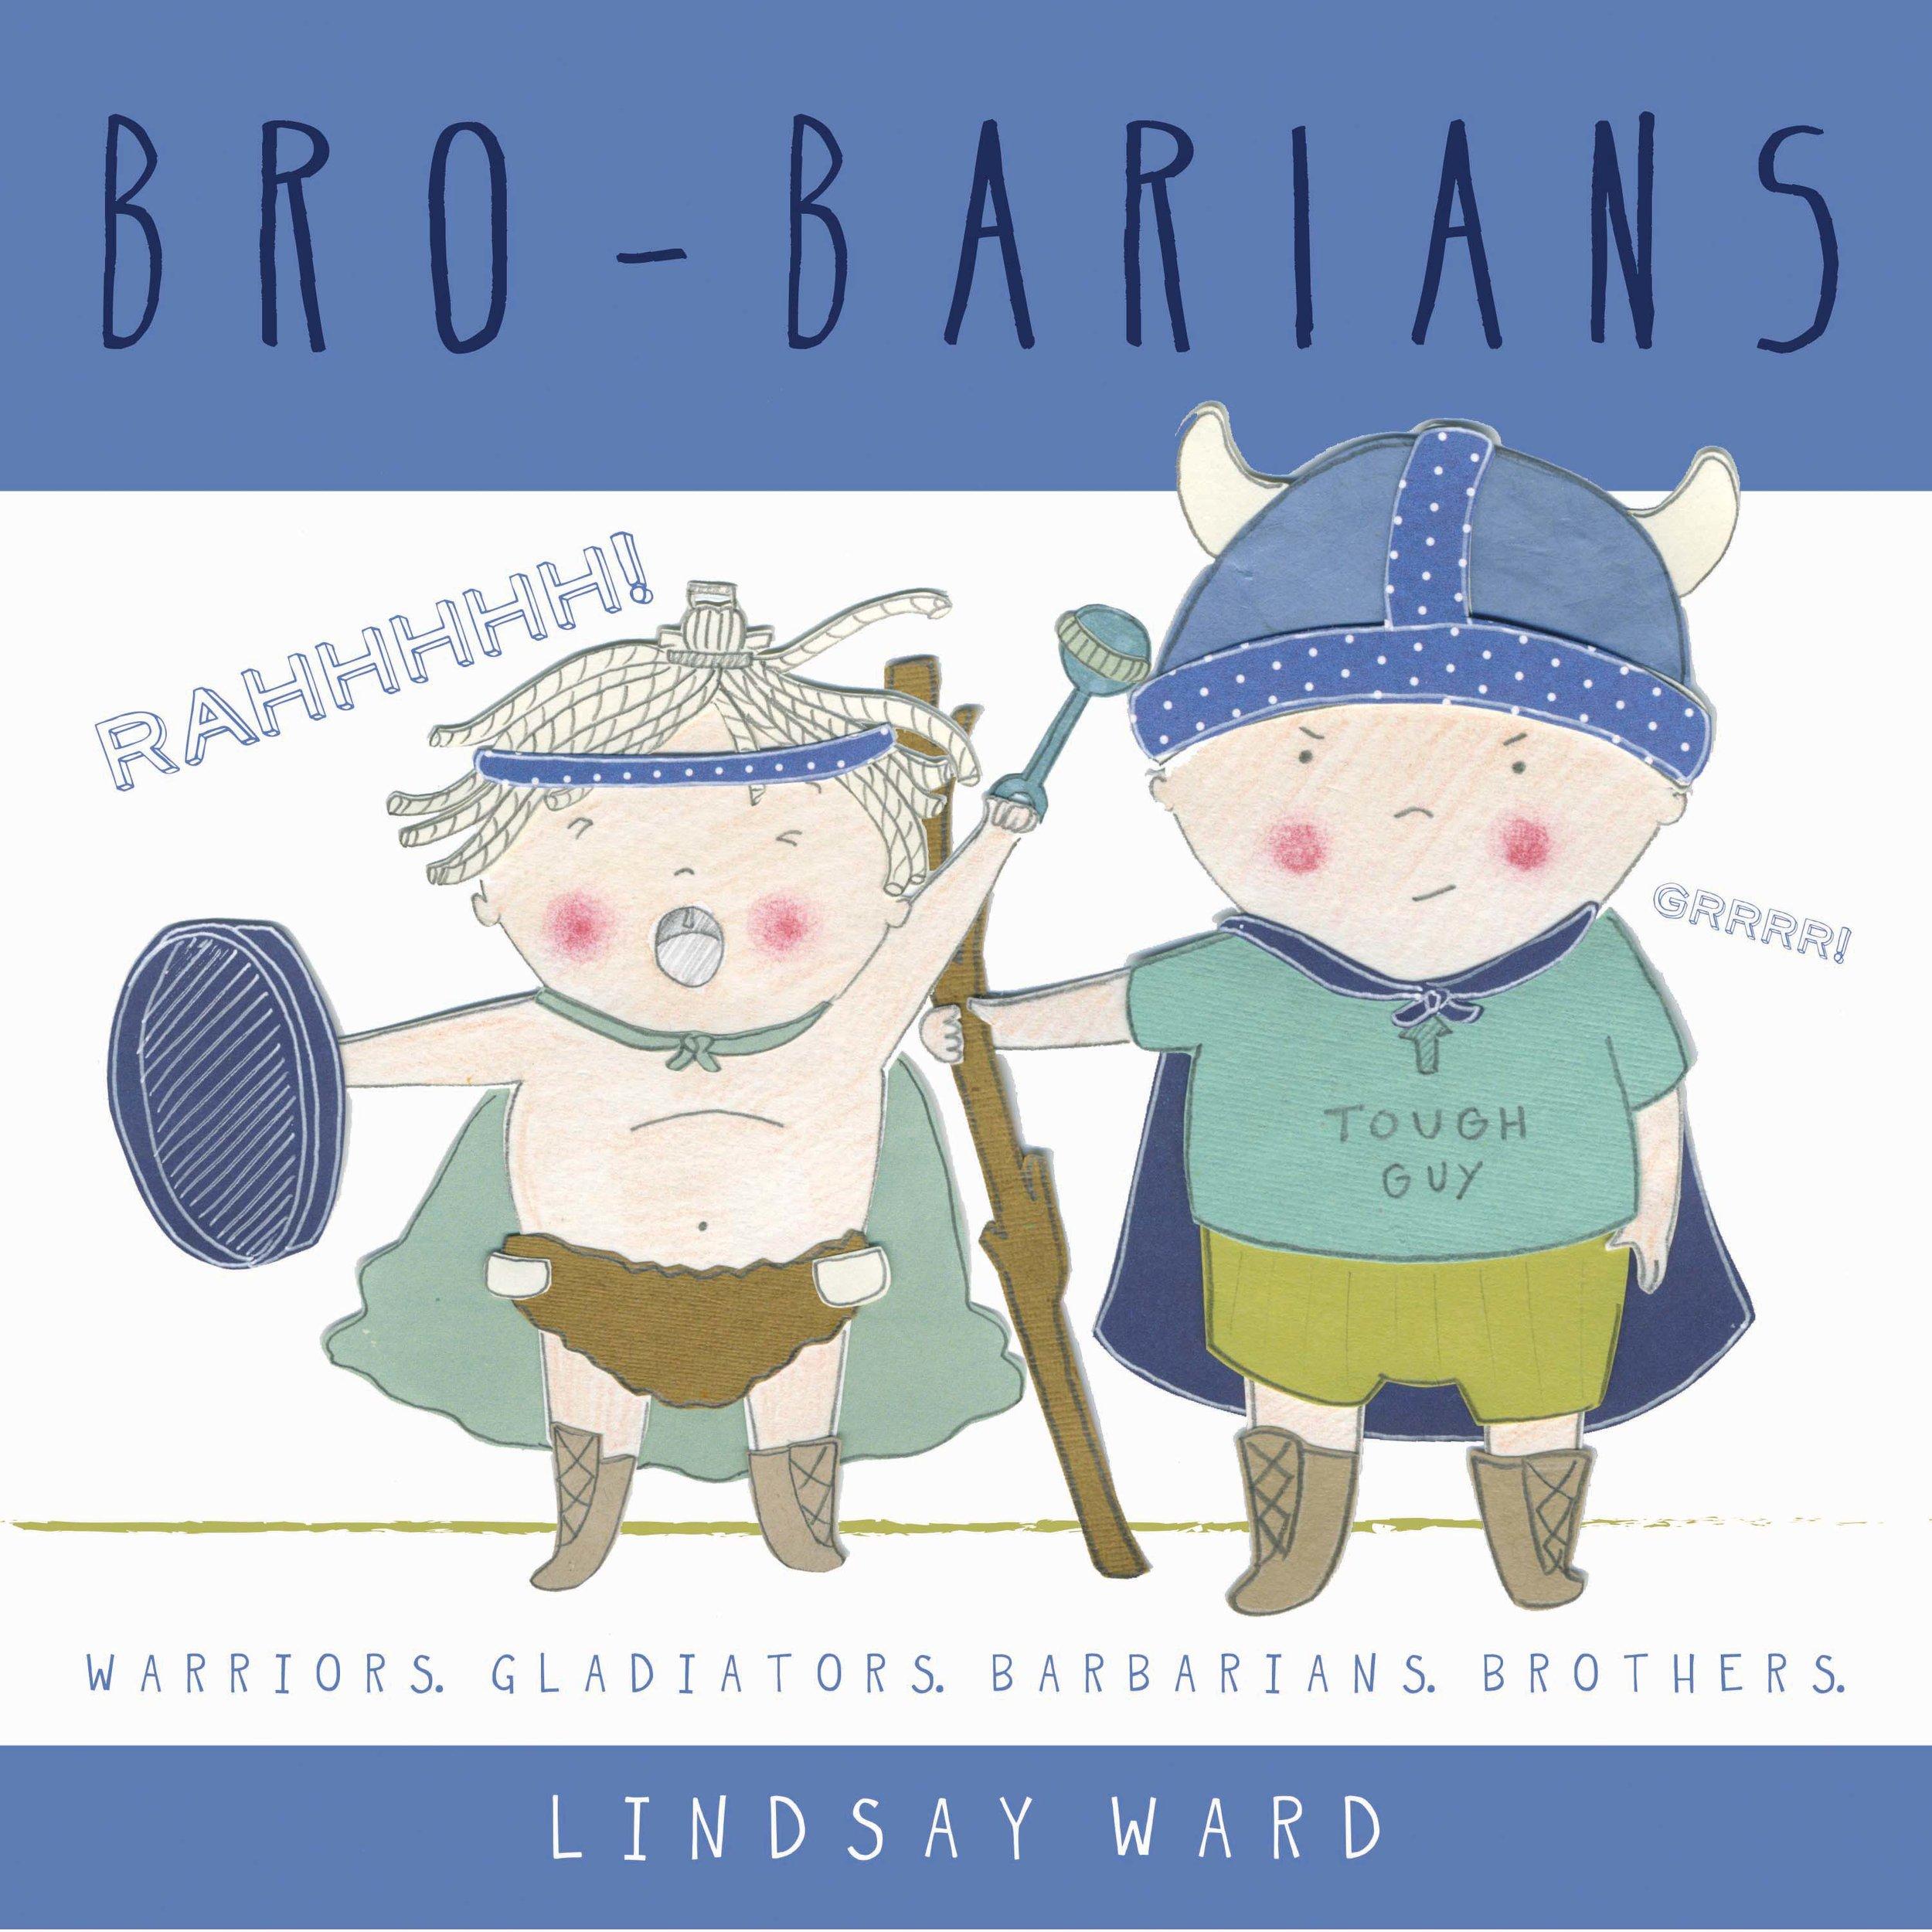 Brobarians  - Original Book Dummy Cover